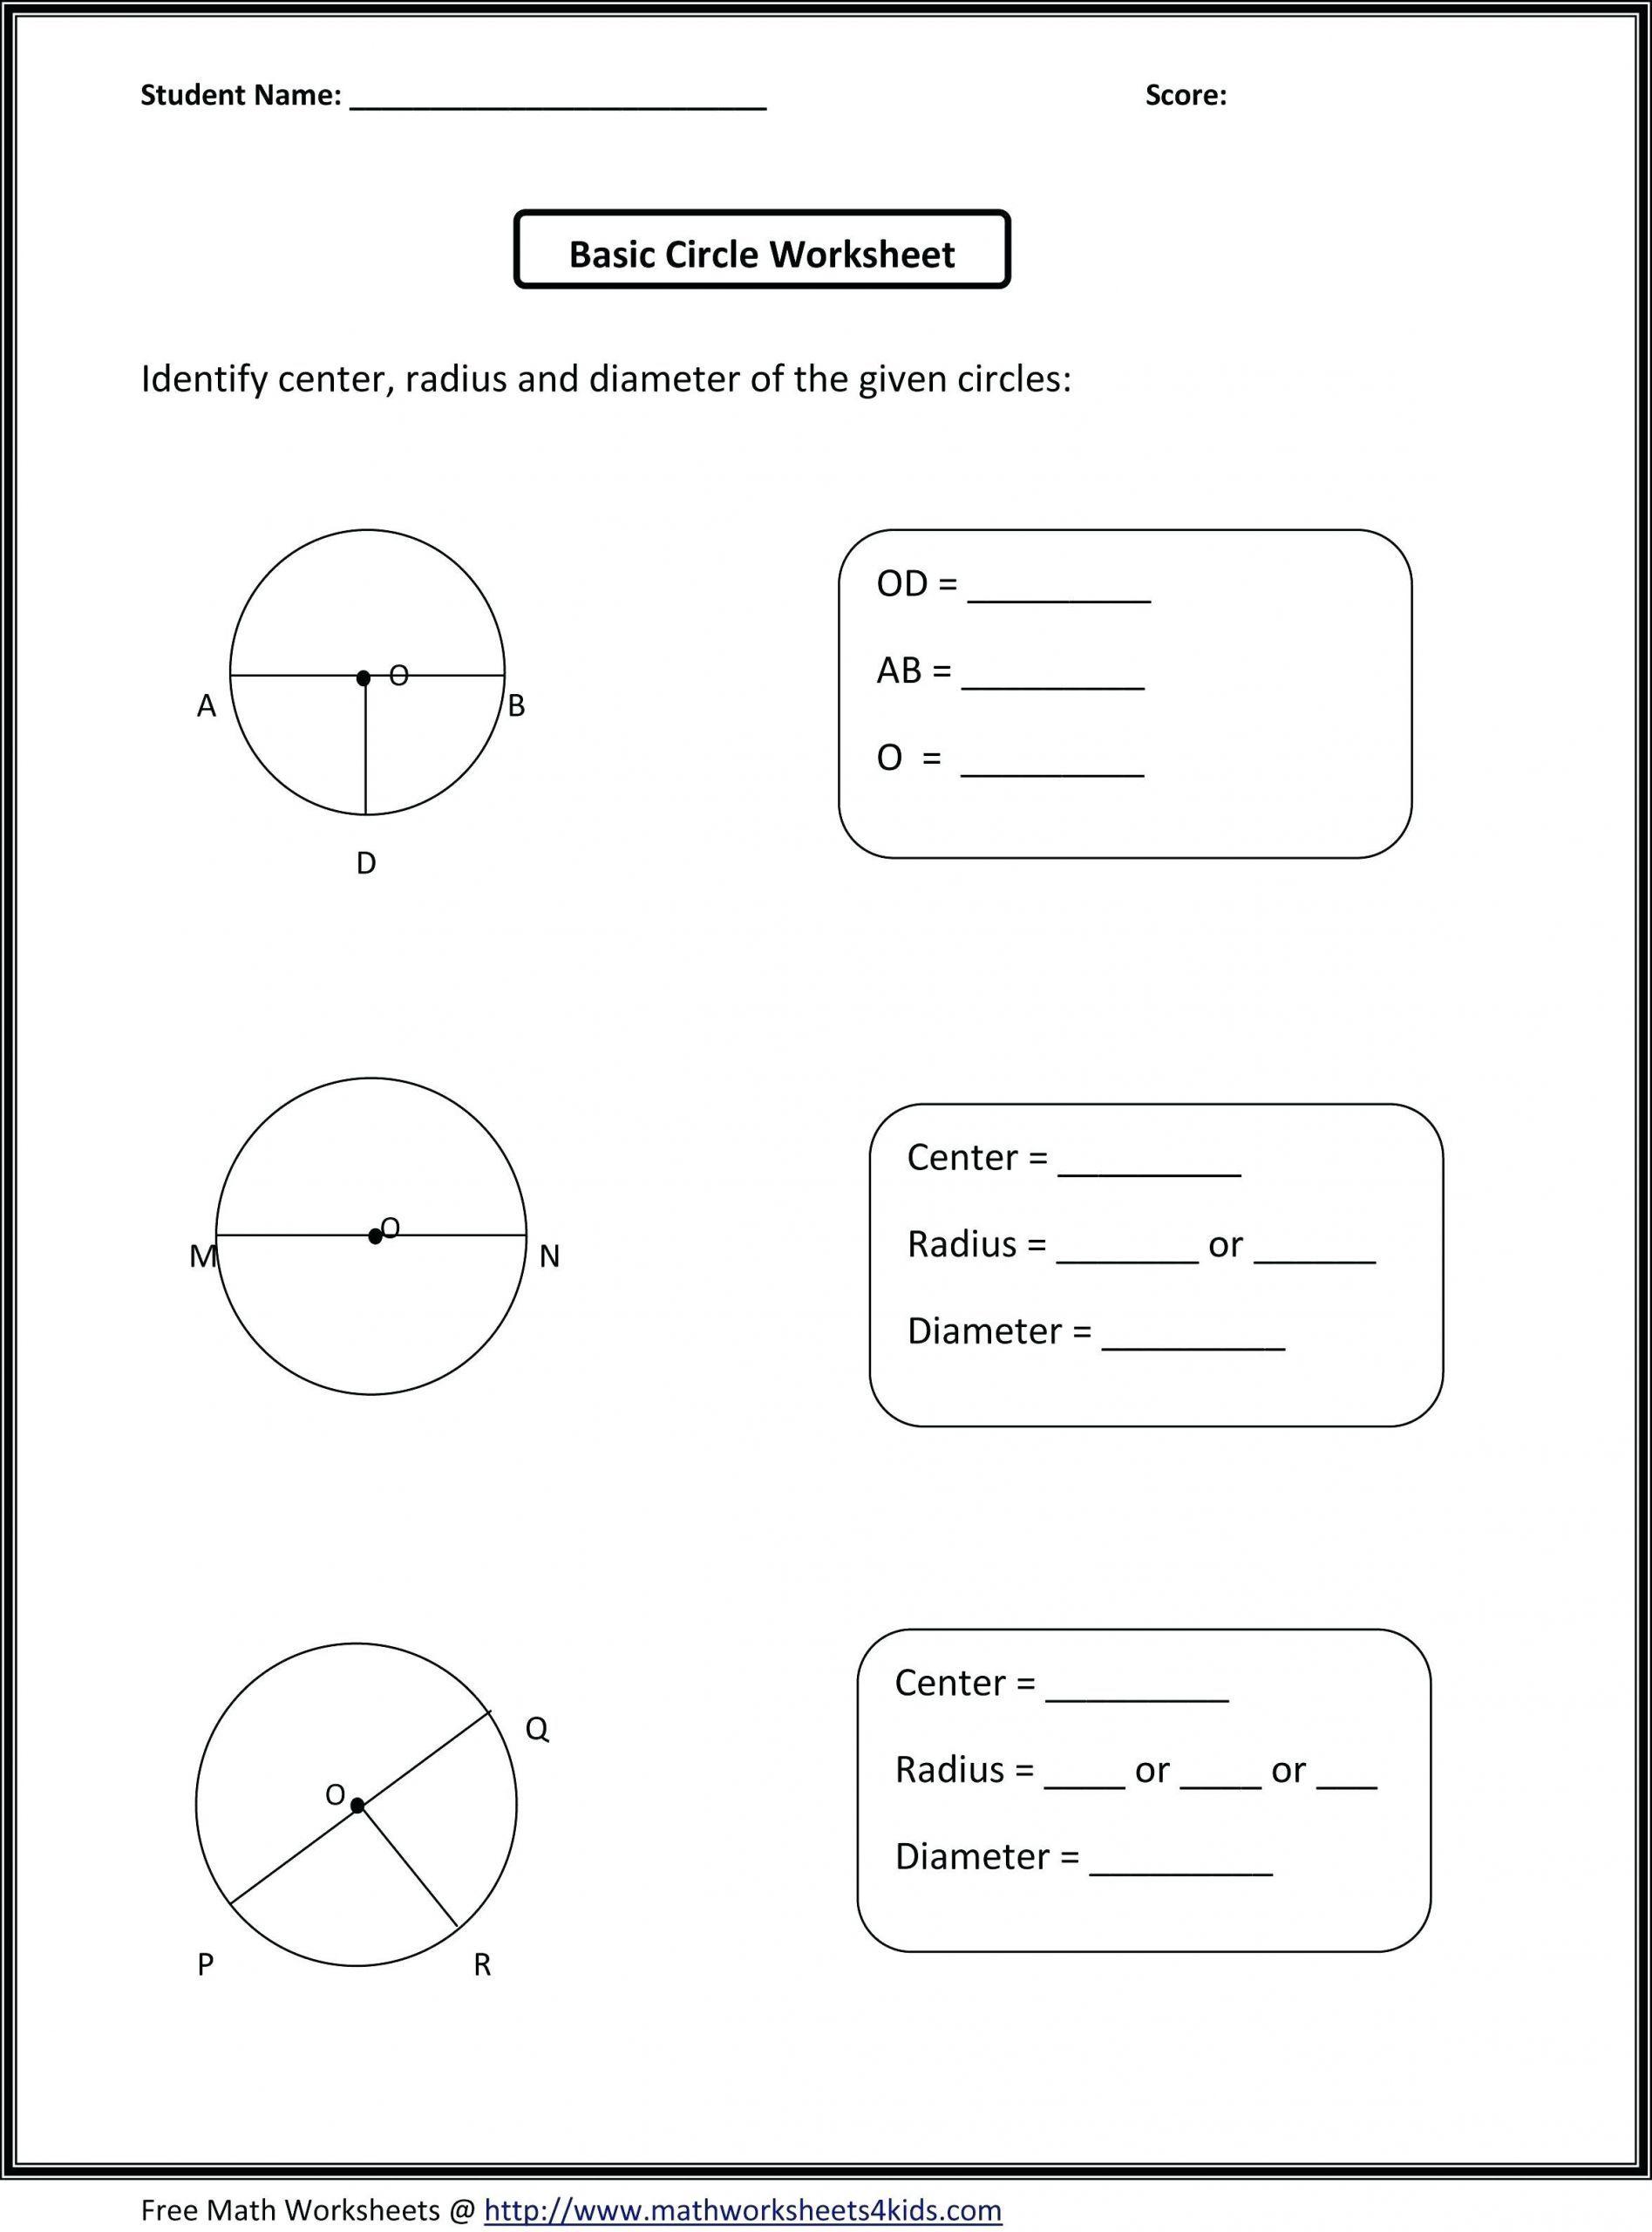 5 Worksheet Math Sheets Multiplication Meiosis Worksheet